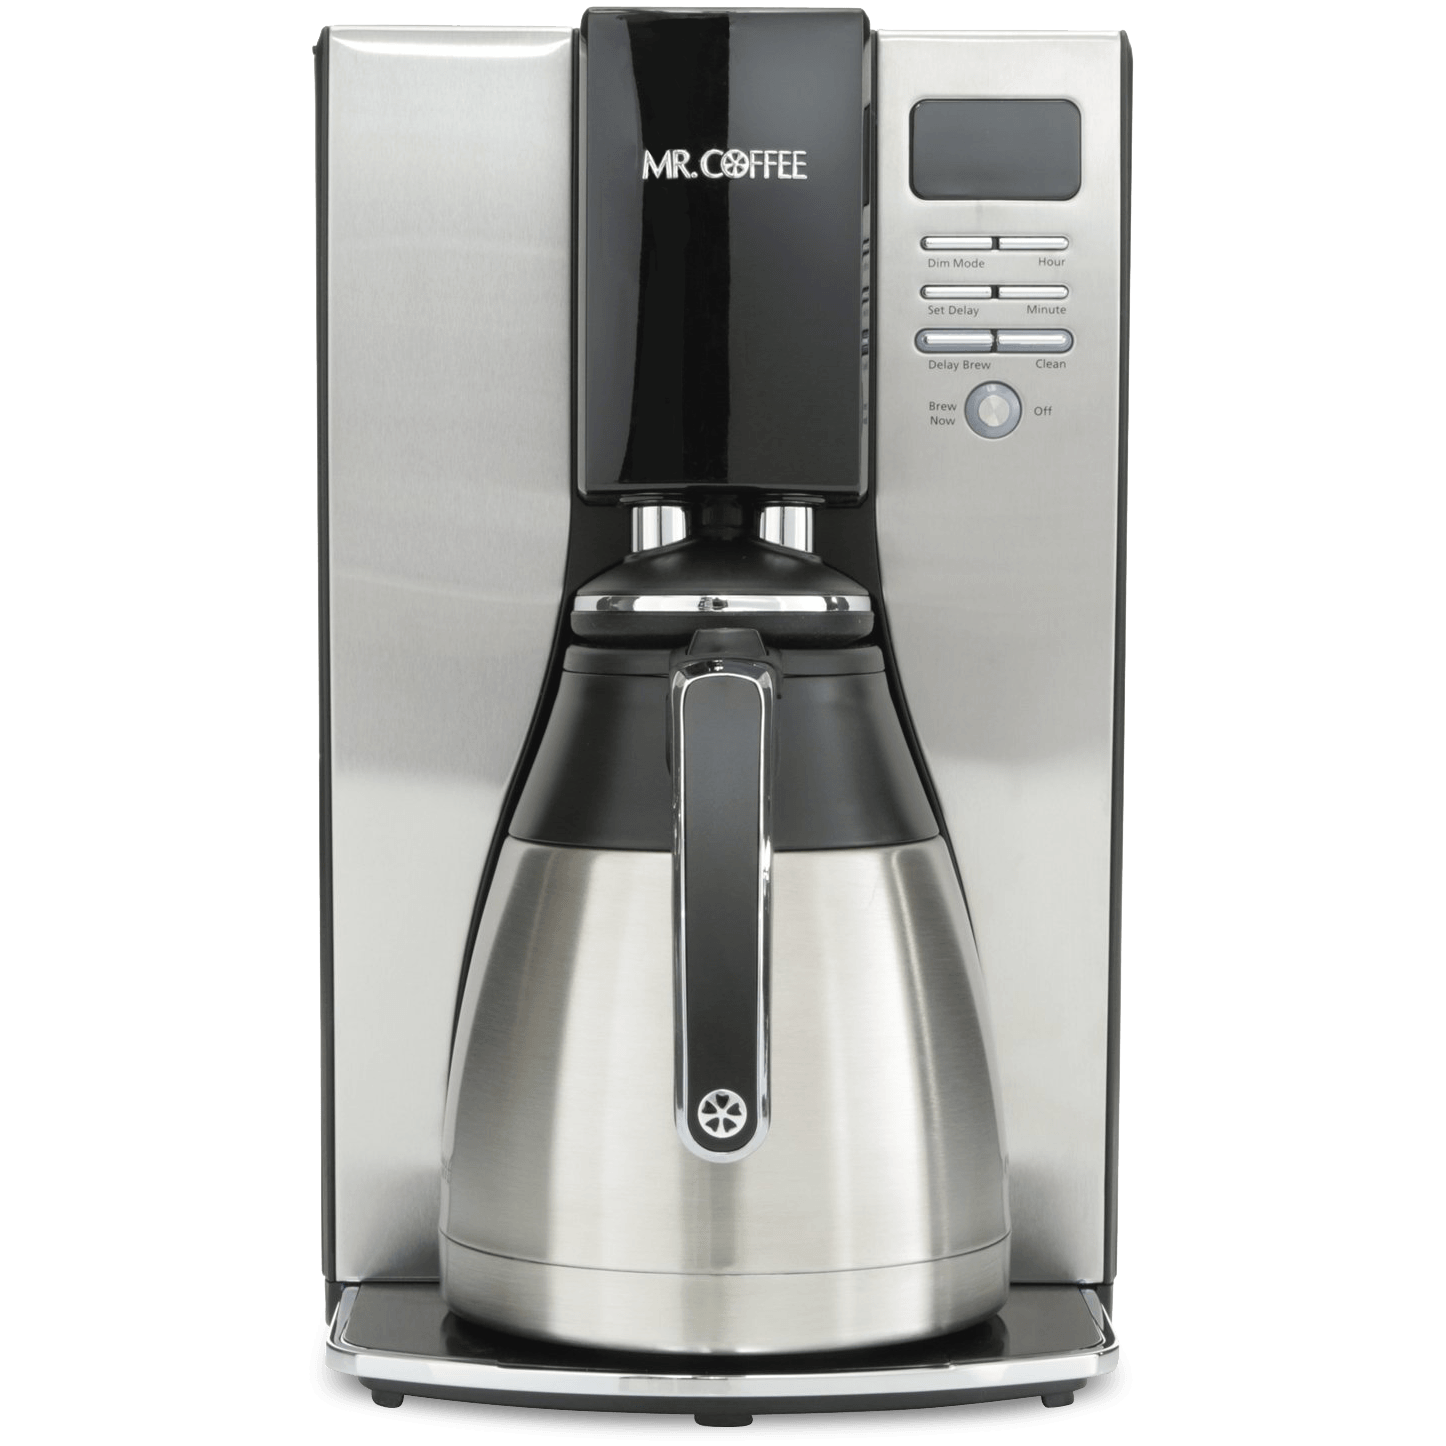 Mr Coffee 10 Cup Thermal Carafe Coffee Maker Refurbished